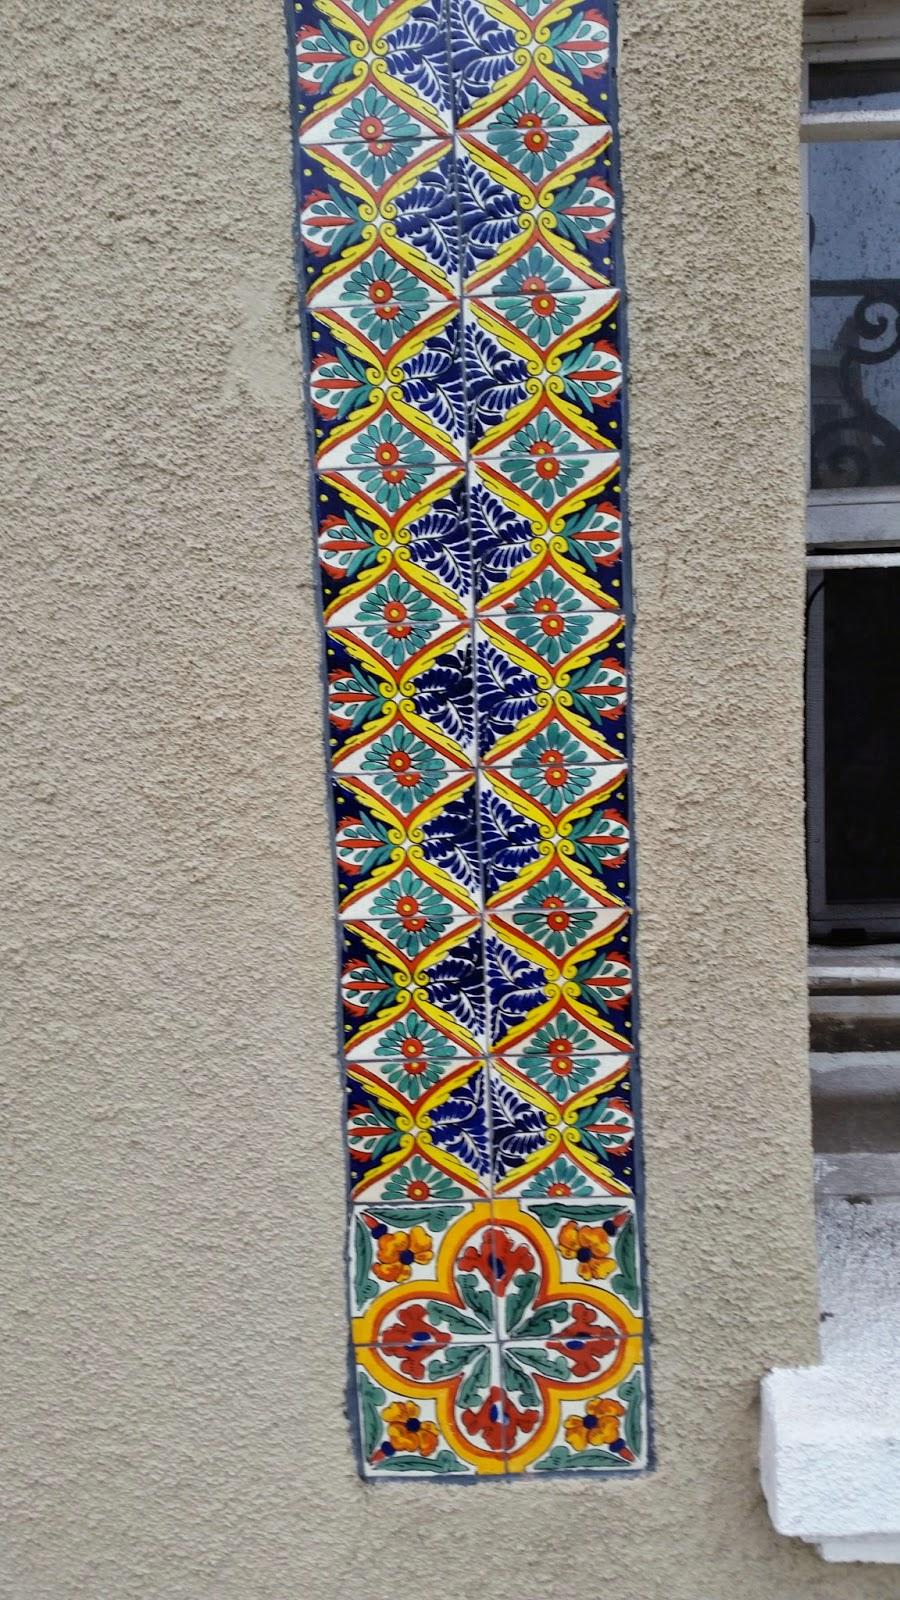 Avente tile talk decorative tile in commercial design for Spanish decorative tile